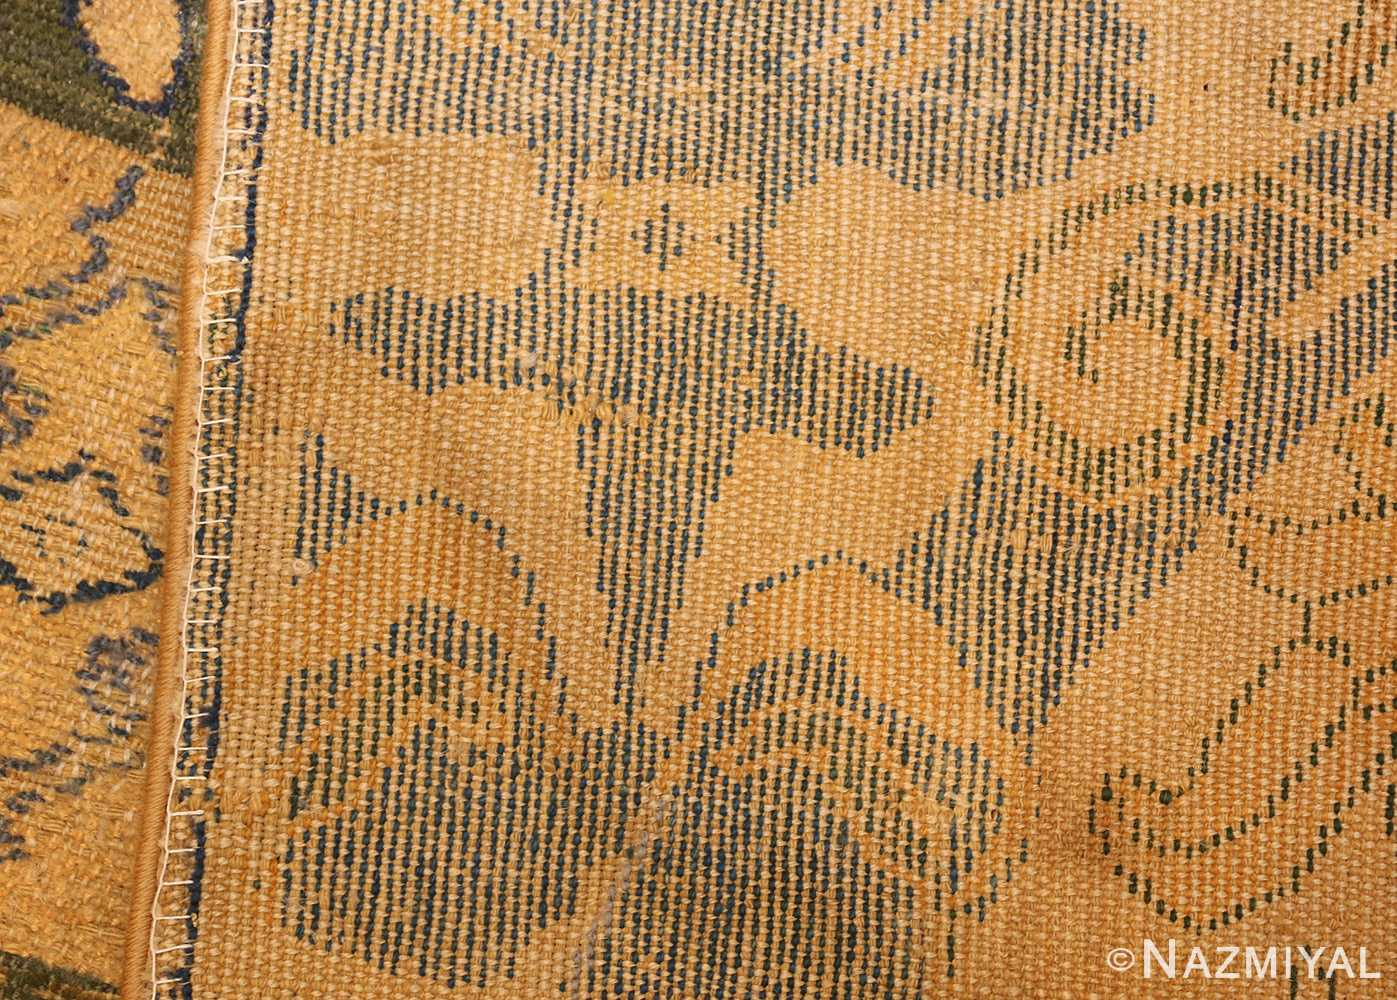 17th century cuenca spanish rug 49270 weave Nazmiyal